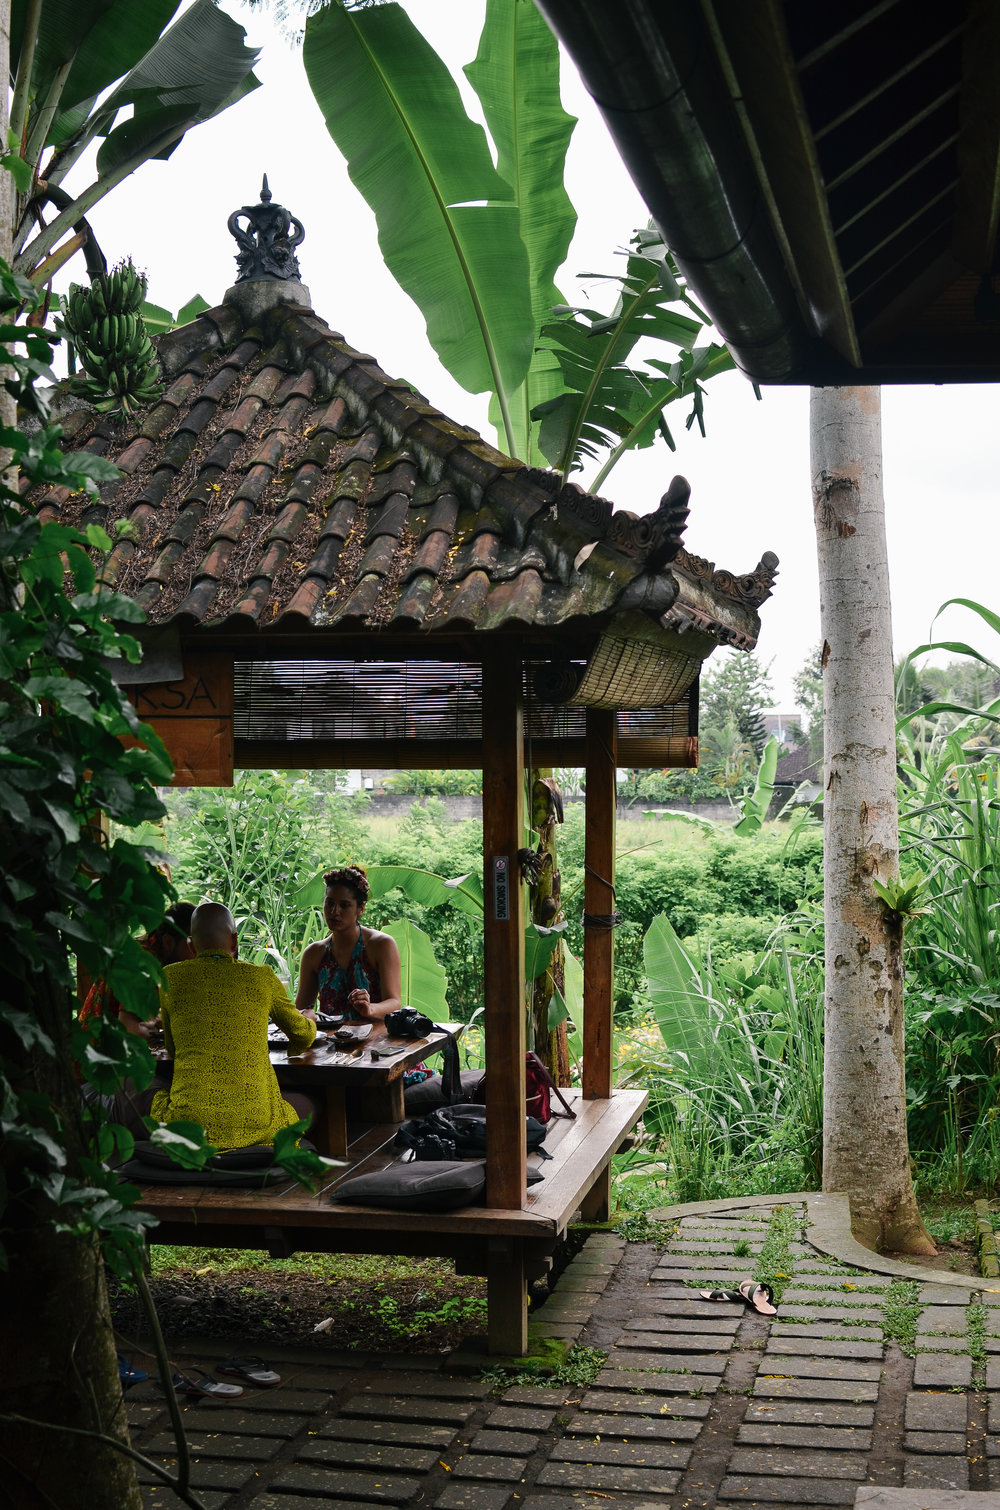 bali+mosca+bamboo+lodge+bali+ubud+lifeonpine_DSC_2732.jpg